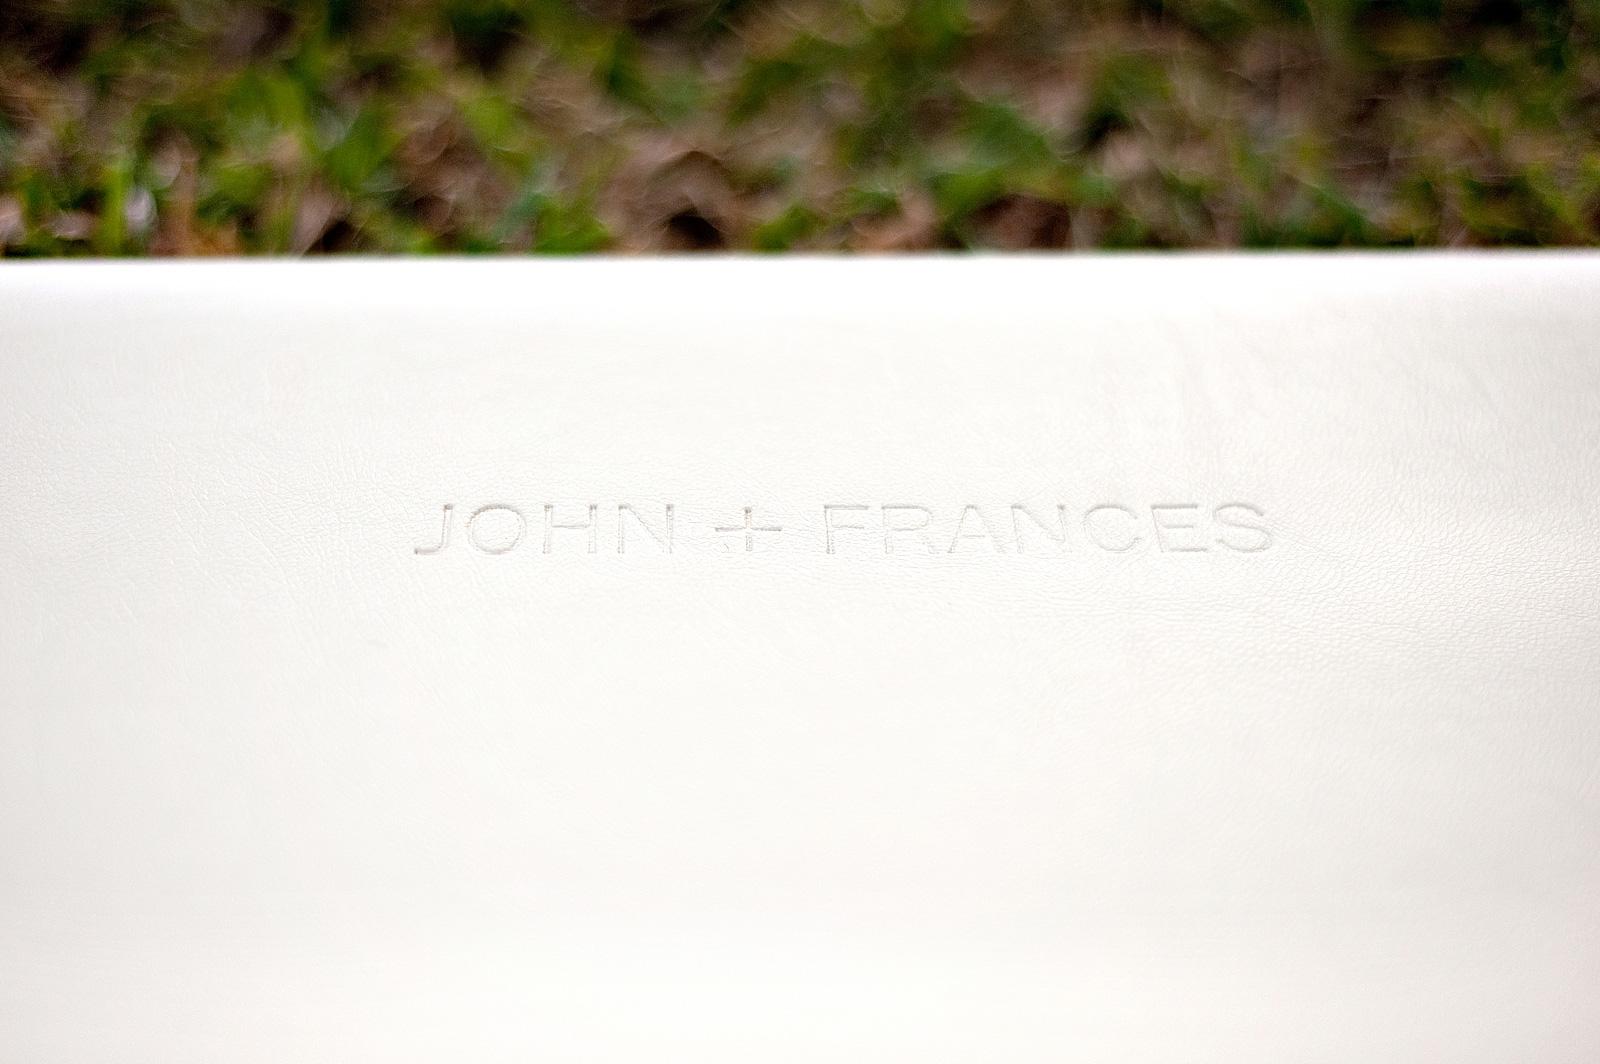 Jacki-Bruniquel-Why-Your-Wedding-Album-Takes-So-Long-11